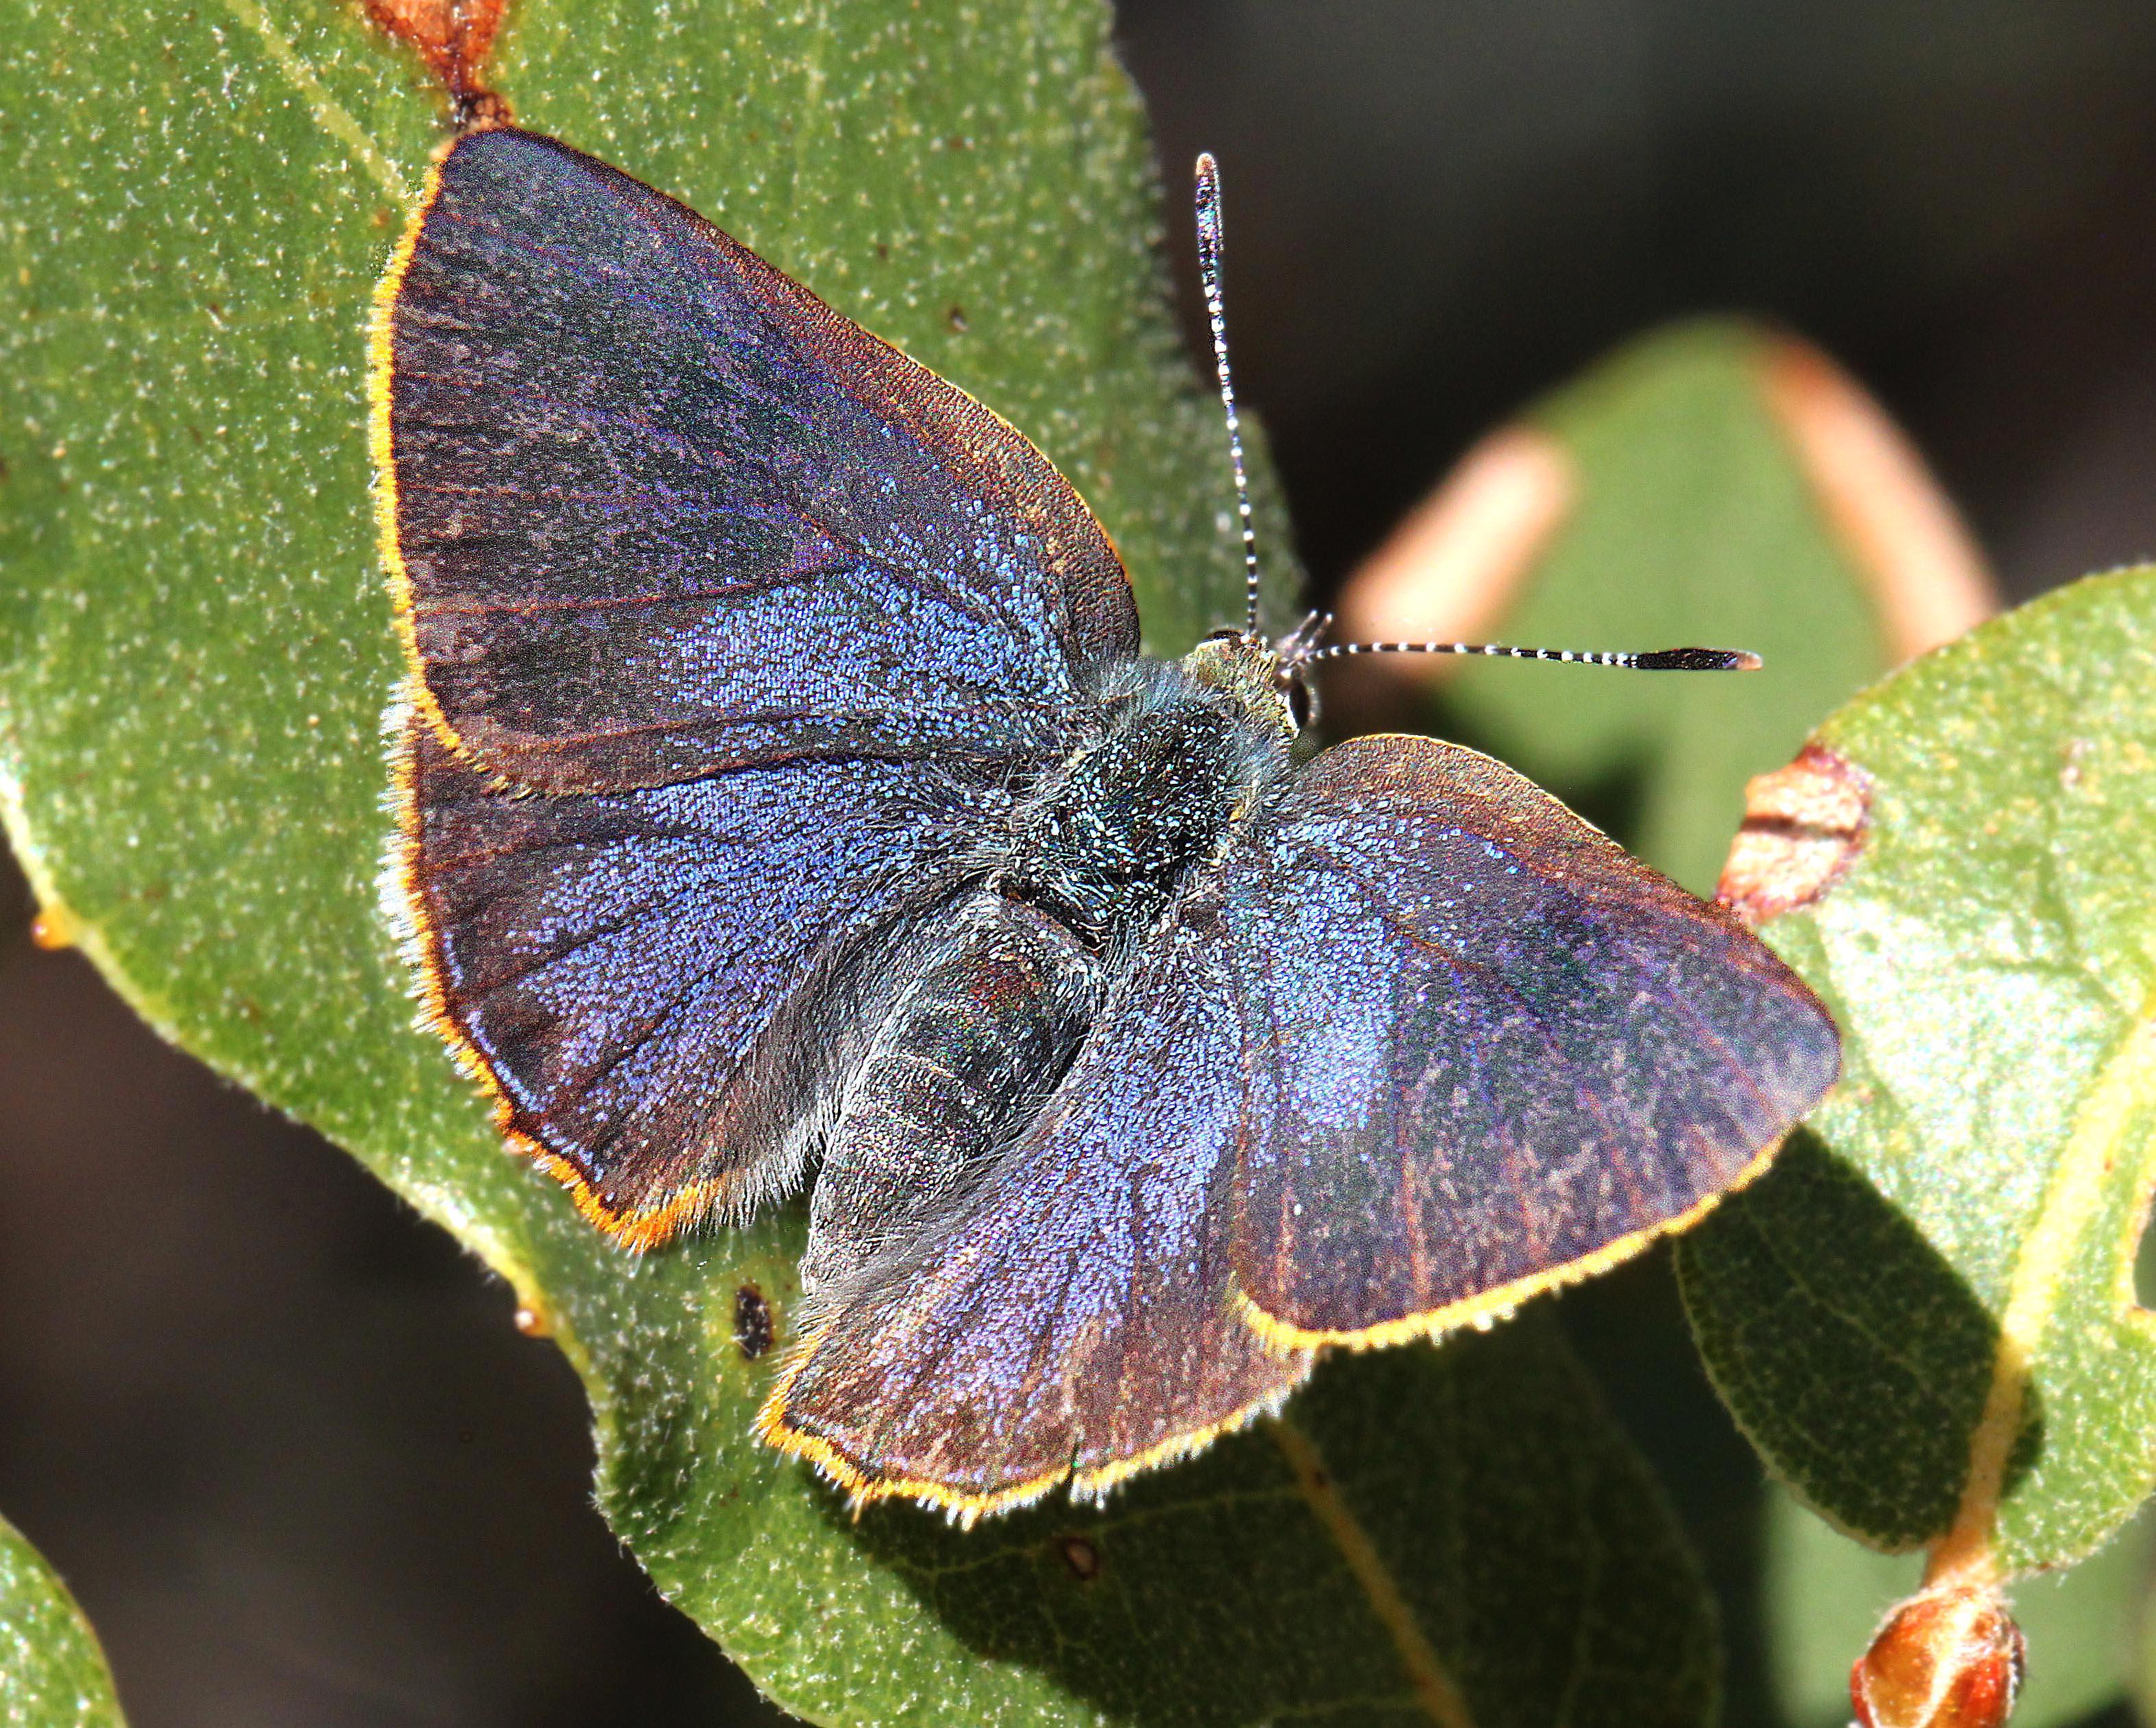 HAIRSTREAK, ARIZONA (Erora quaderma) (4-12-12) madera cyn, scc, az -01b, Animal, Butterfly, Foliage, Insect, HQ Photo